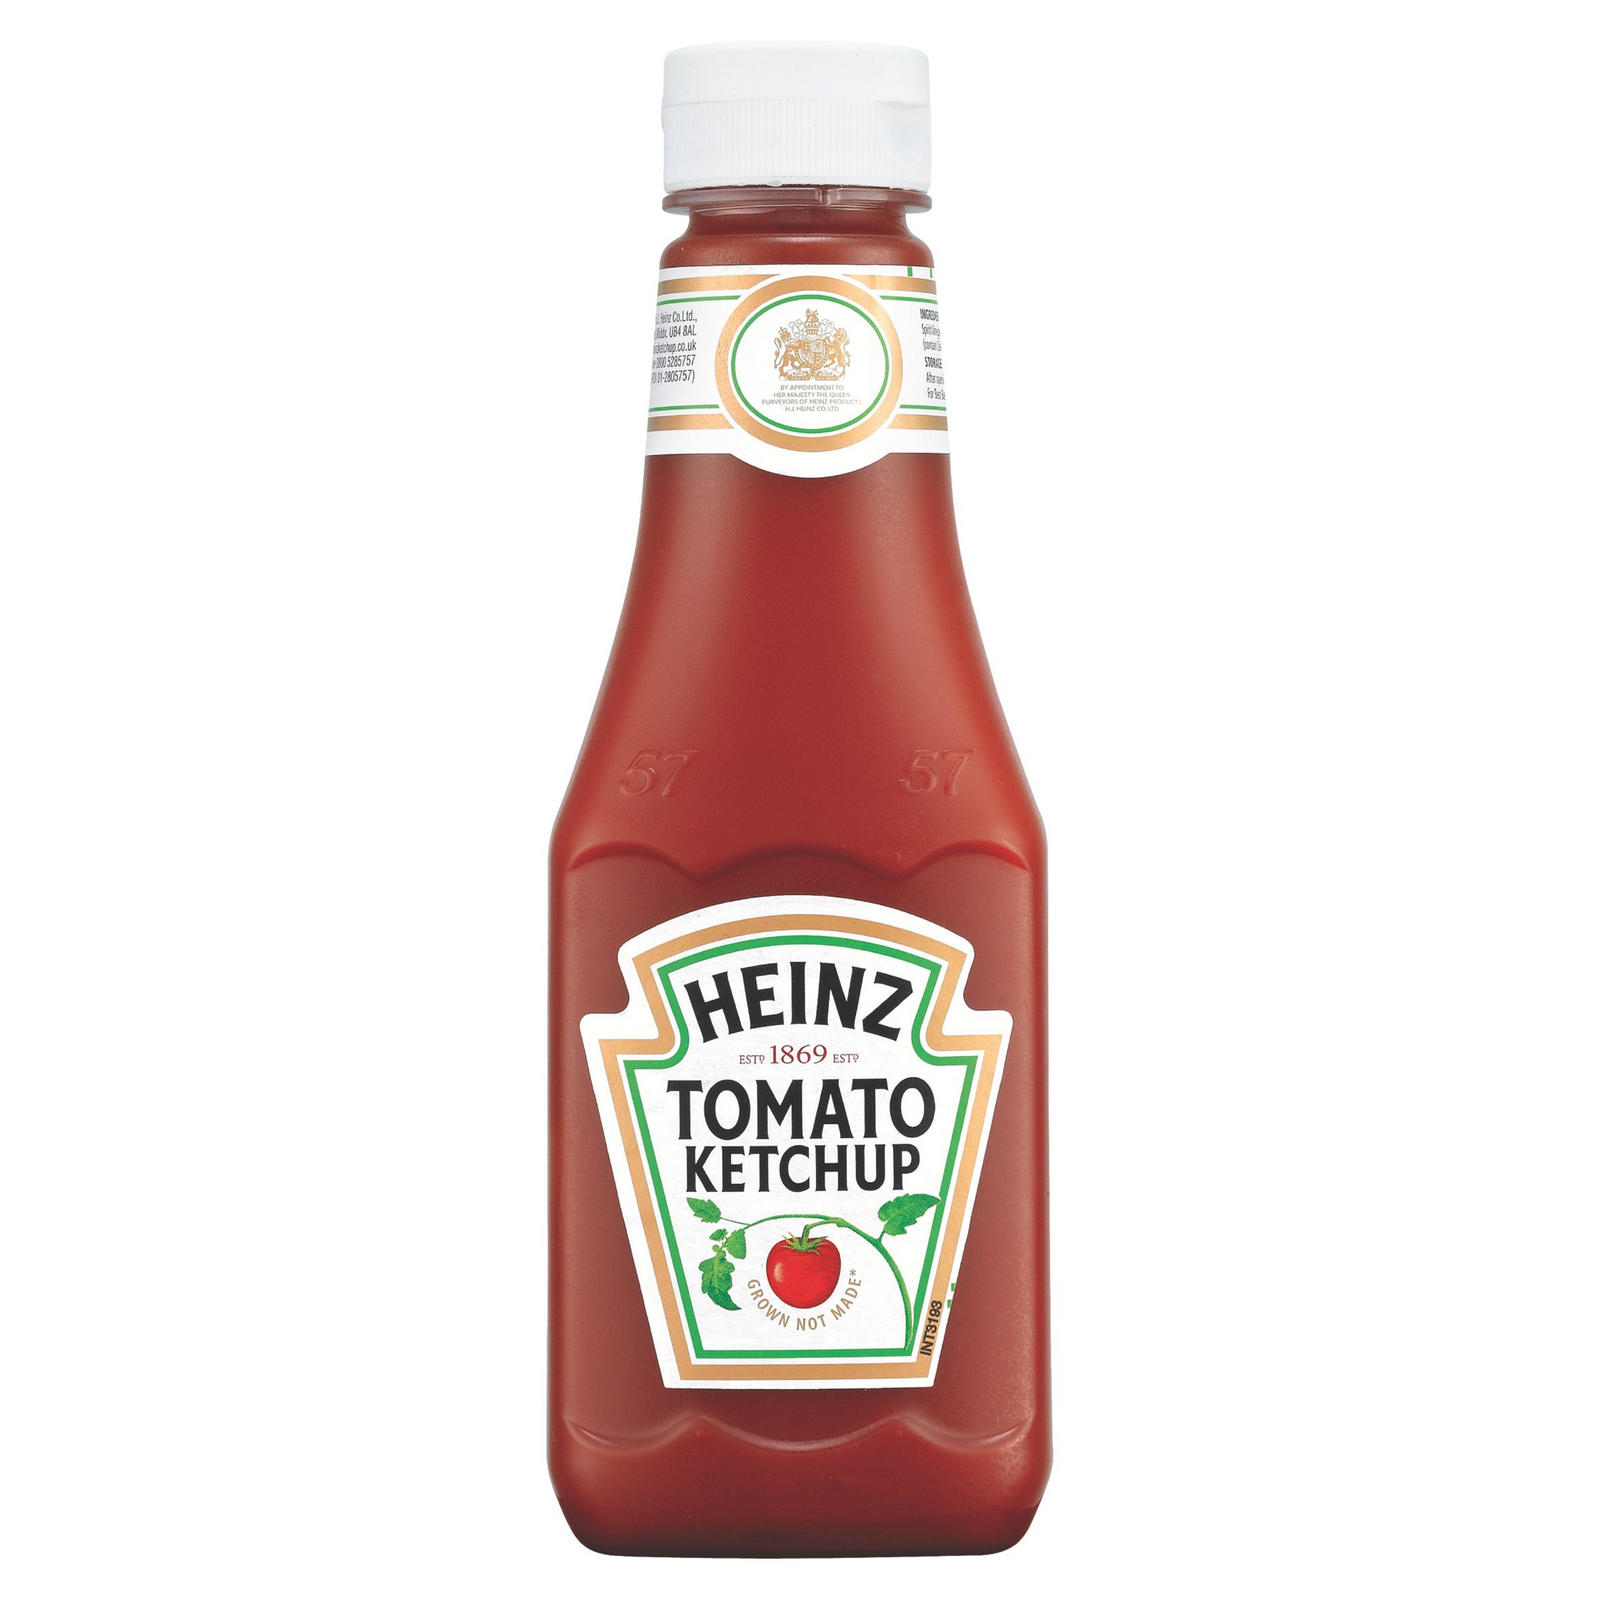 Heinz Tomato Ketchup 342g Table Sauce Iceland Foods